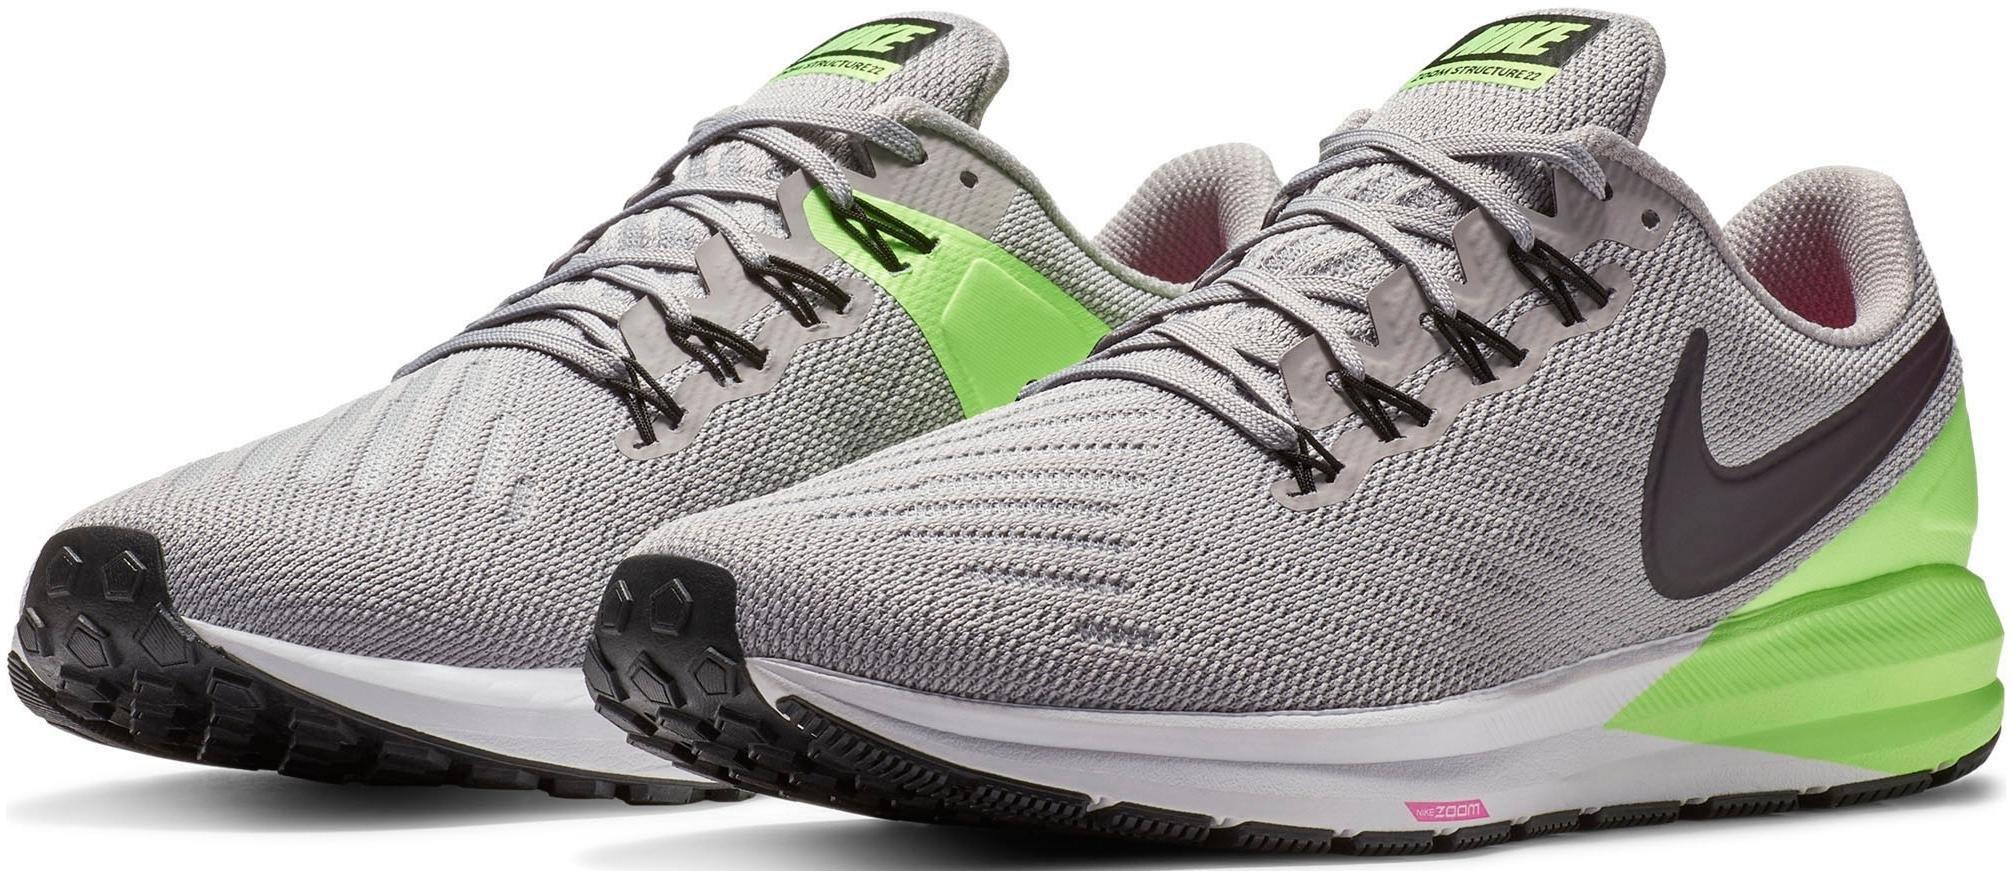 Nike runningschoenen »Air Zoom Structure 22« - gratis ruilen op otto.nl